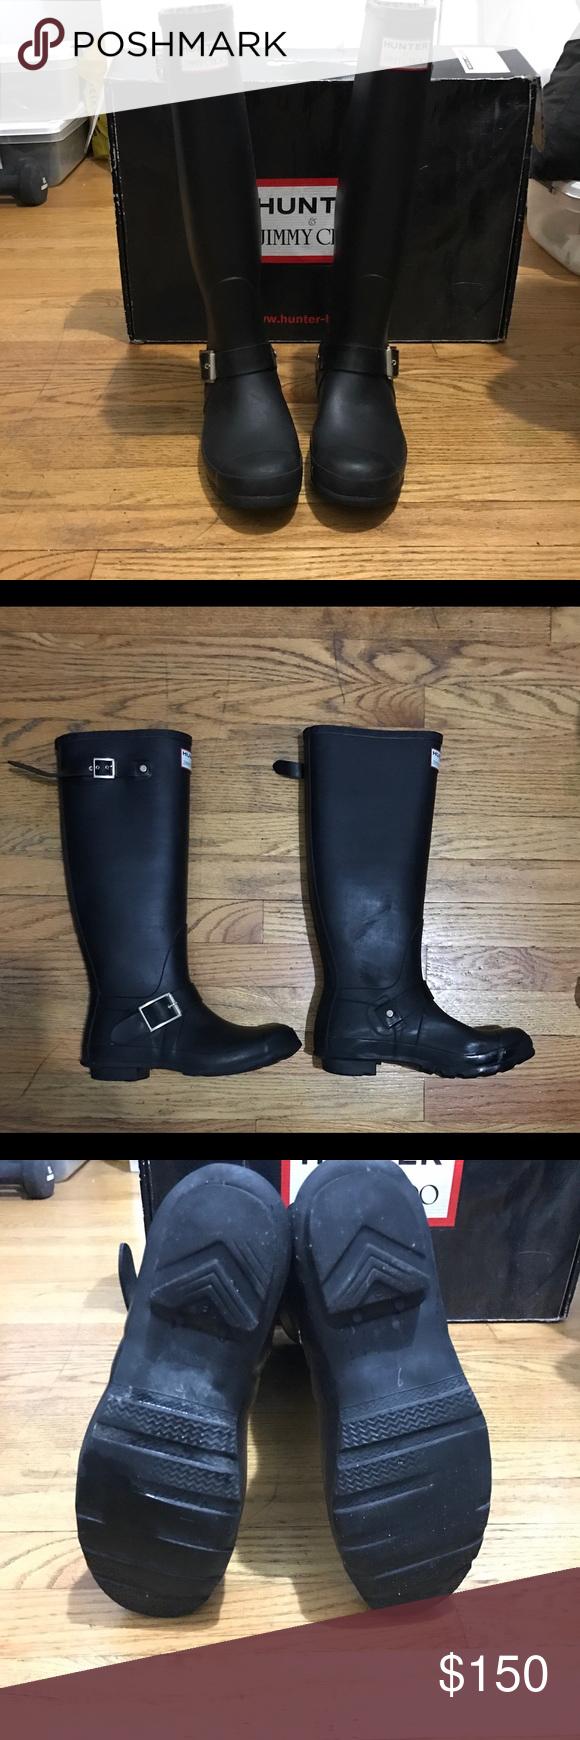 9cf3144373b Authentic Jimmy Choo x Hunter Boots Beautiful Jimmy Choo x Hunter rainboots  in black. Worn